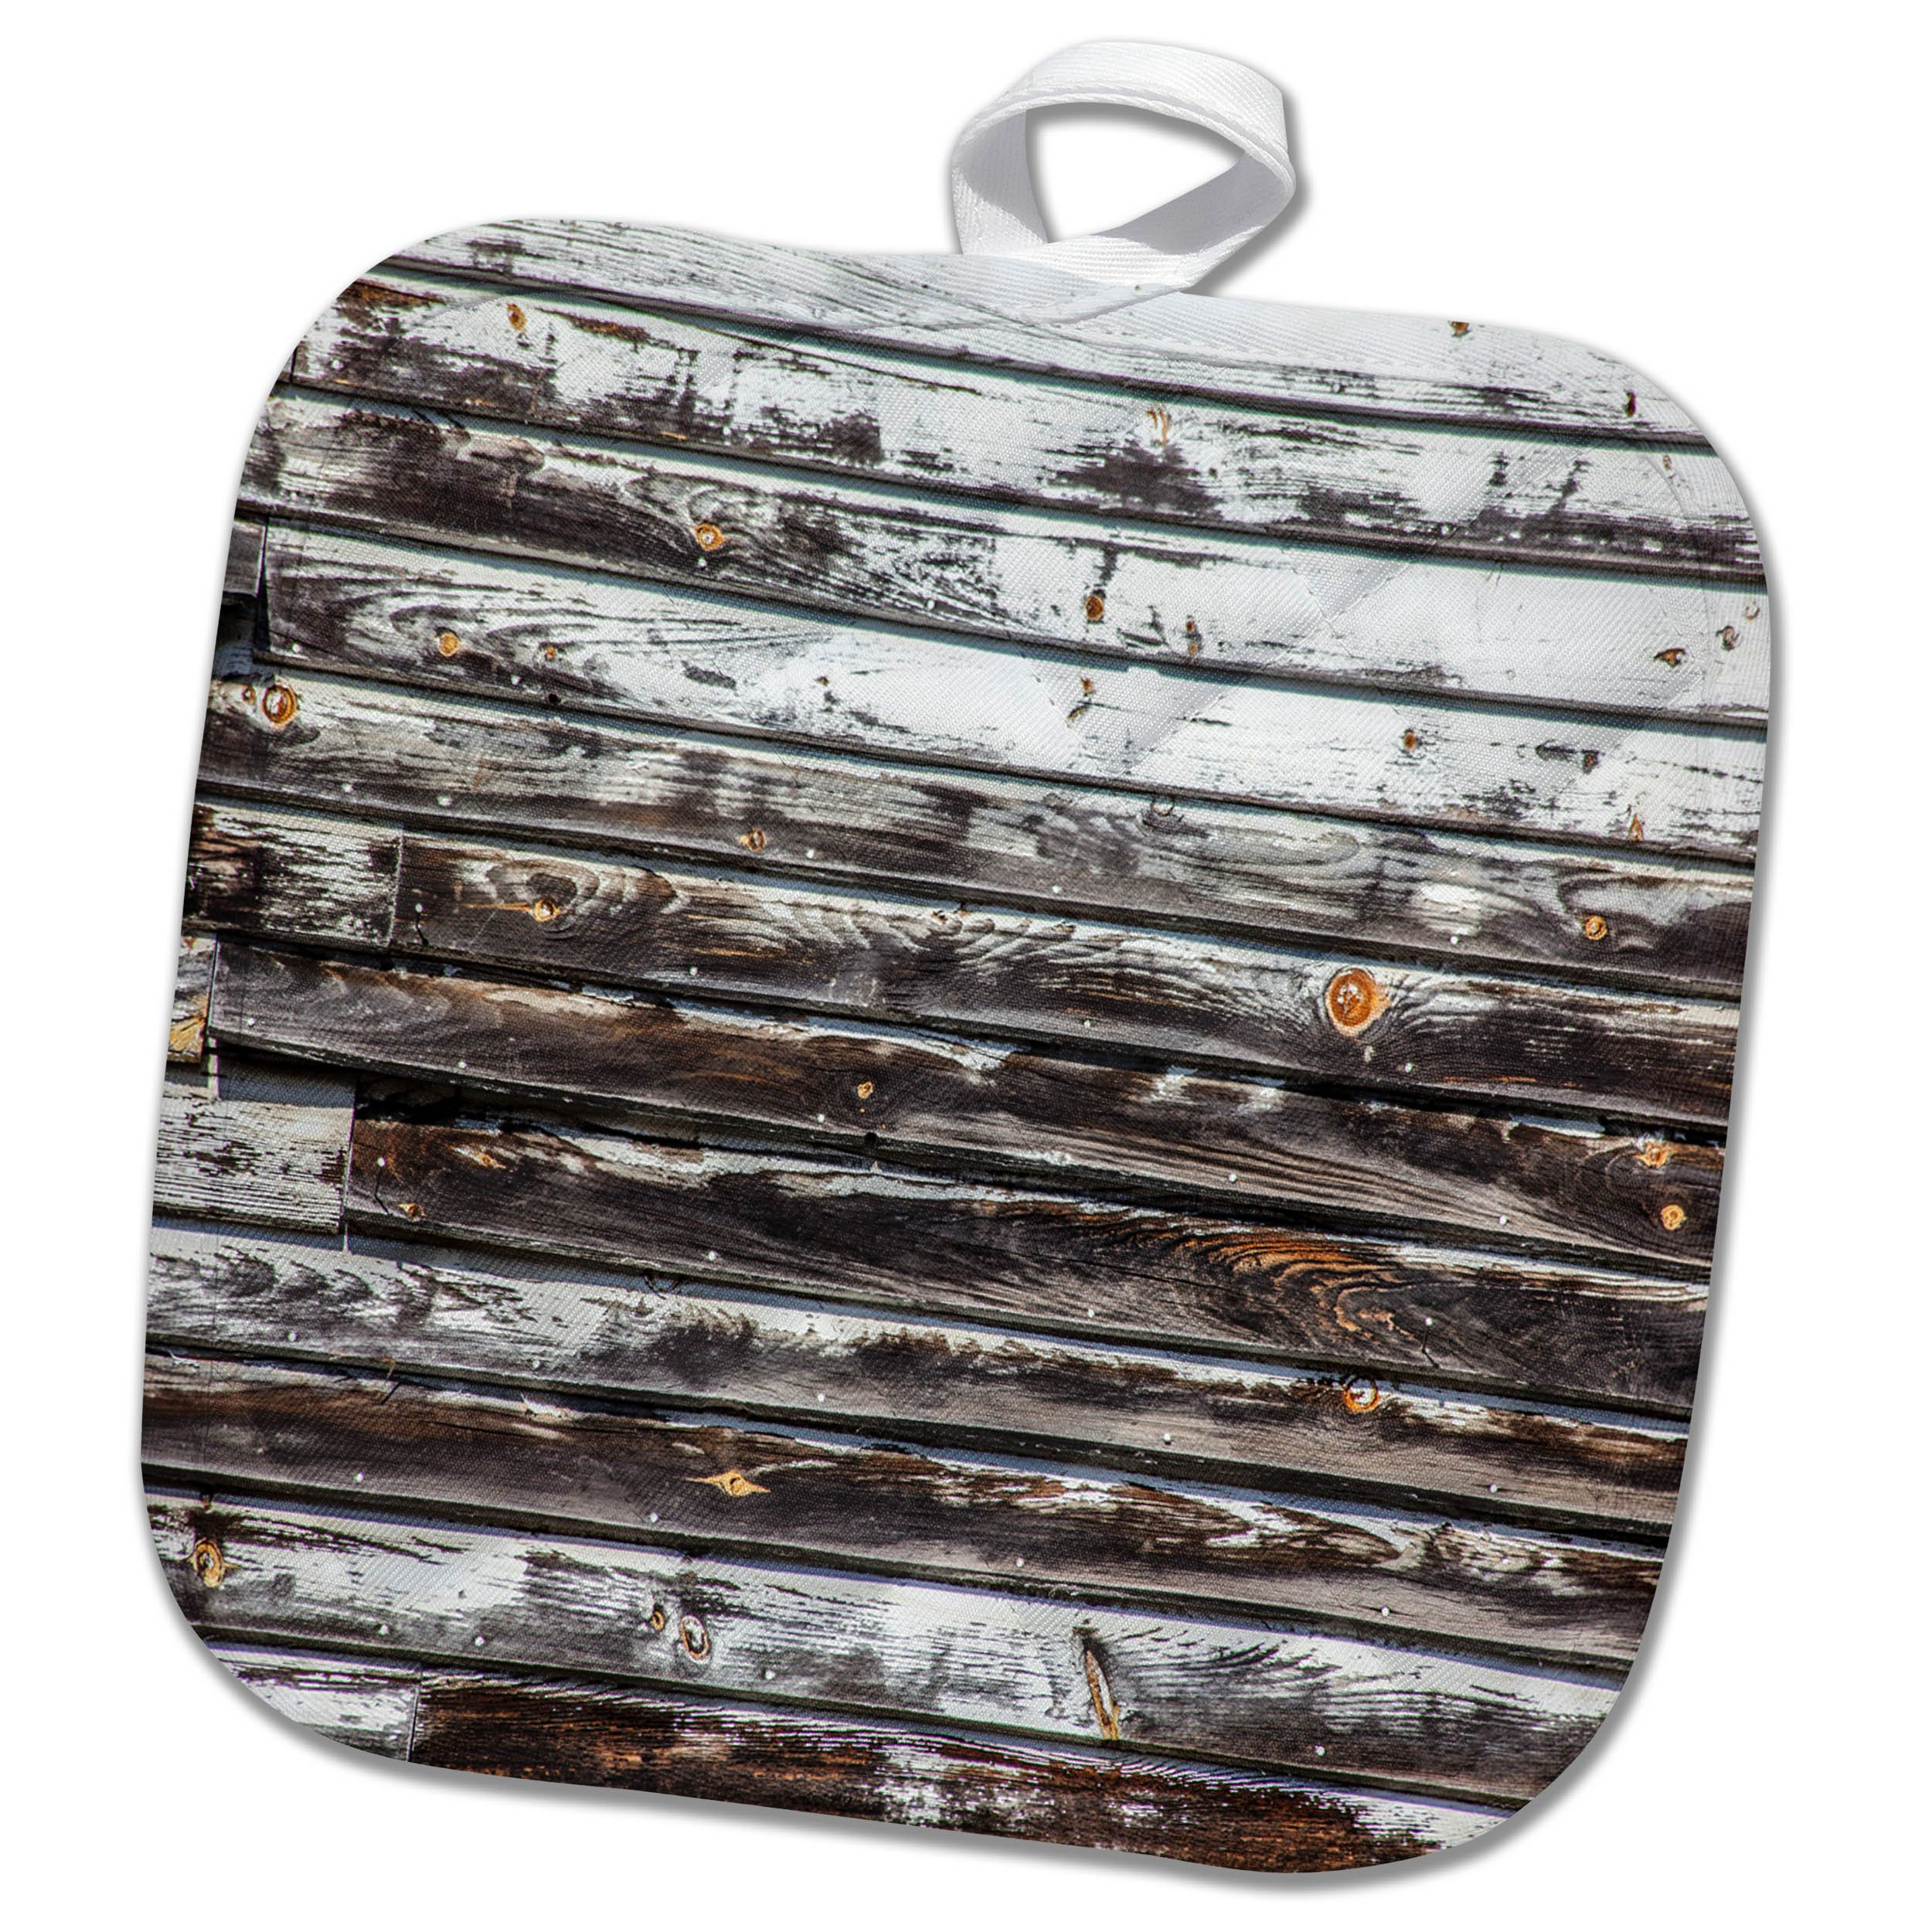 3dRose TDSwhite – Miscellaneous Photography - Weathered Wood Siding Chipped Paint - 8x8 Potholder (phl_285288_1)